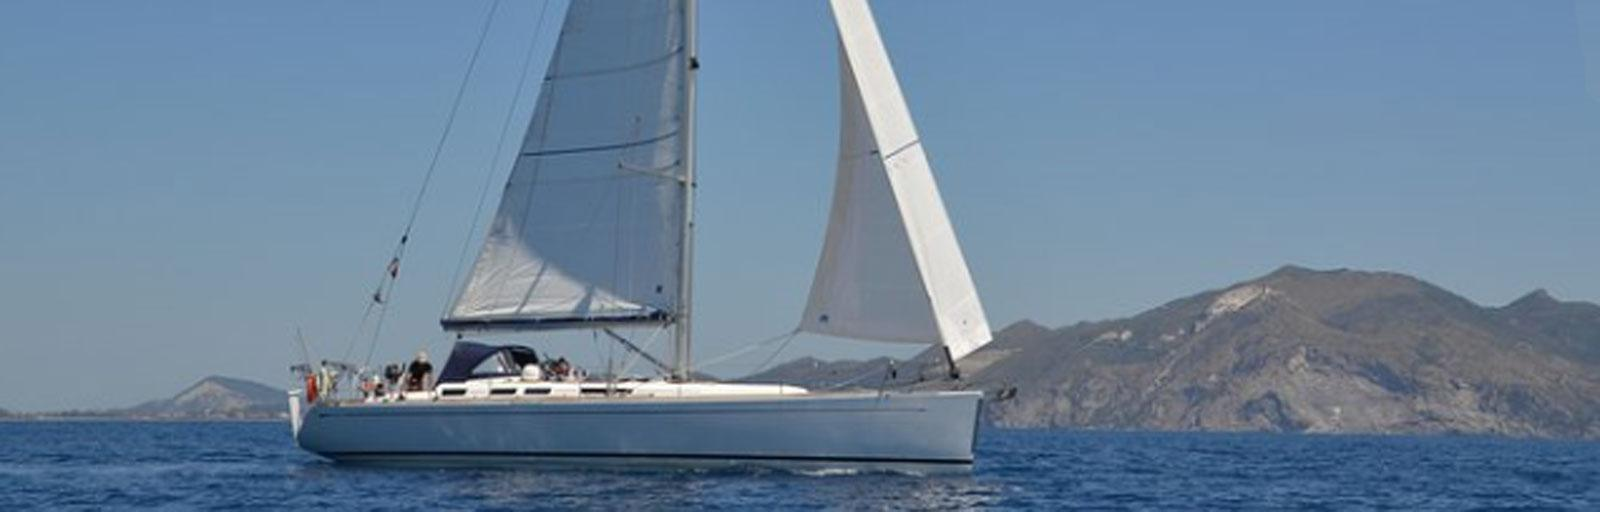 AYC Yachtbrokers - Grand soleil 50